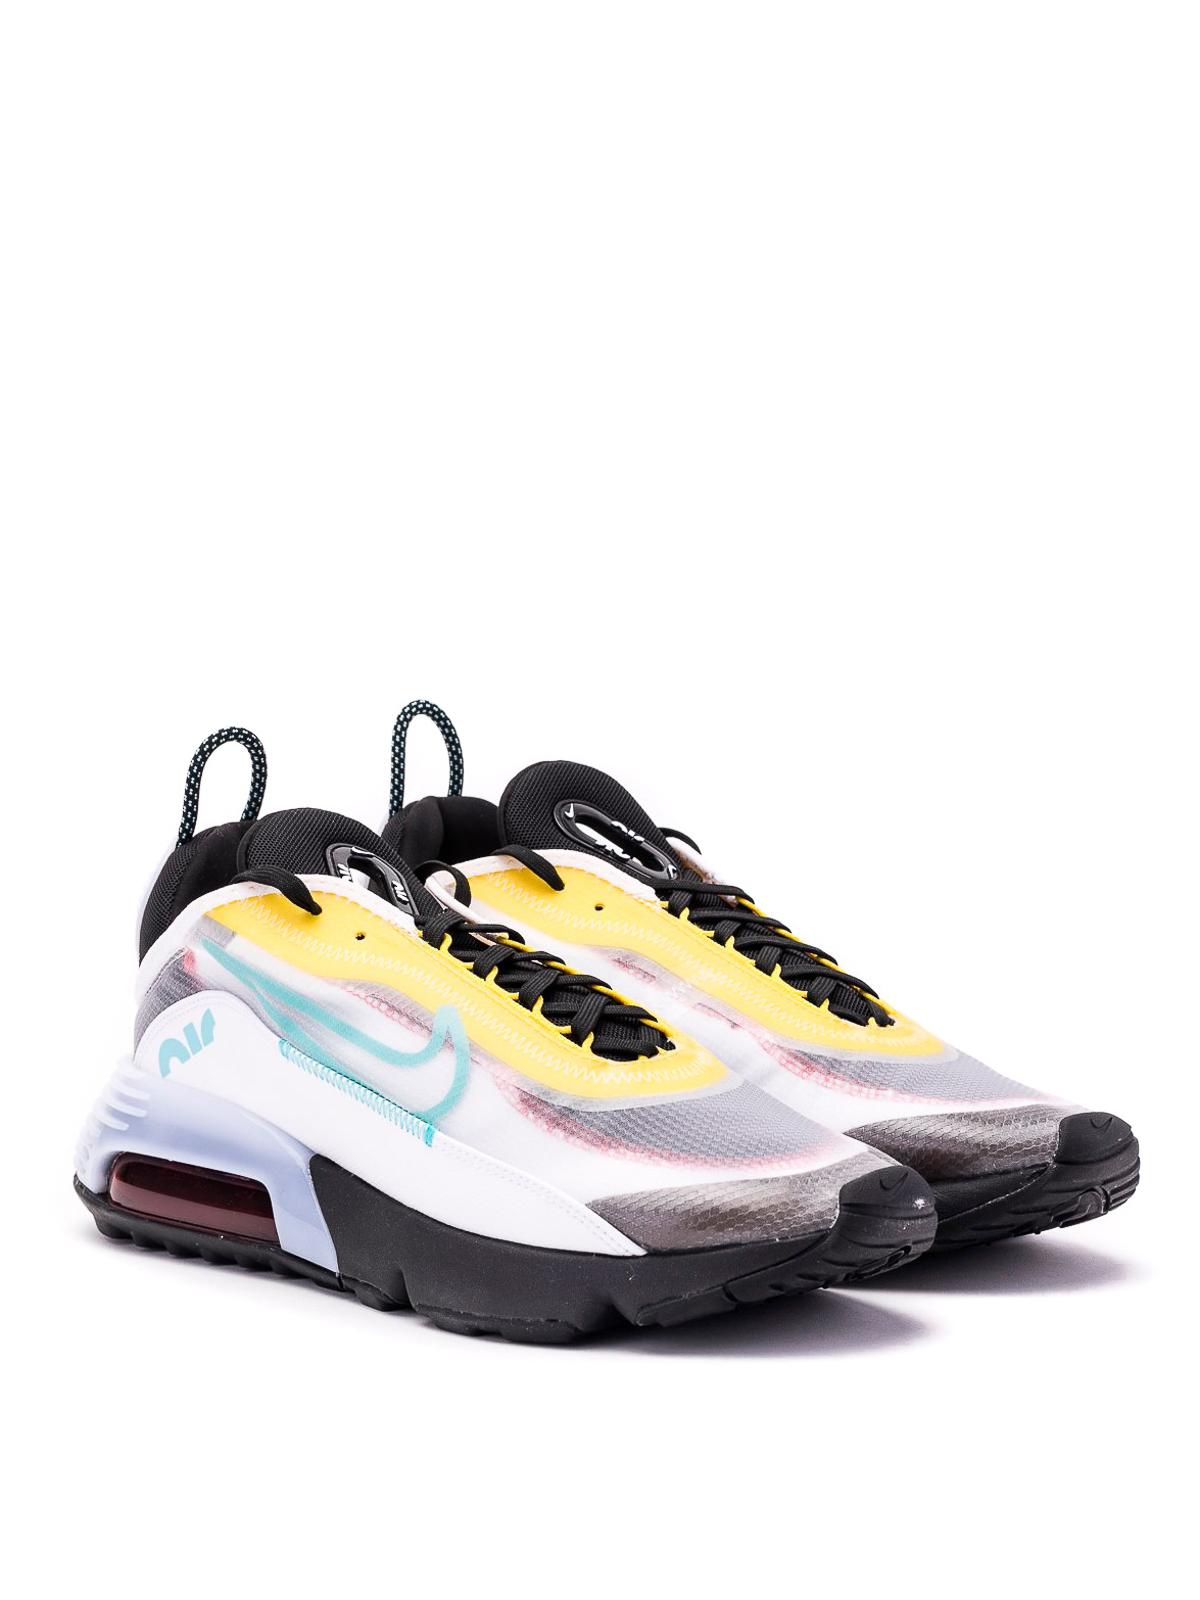 Sudamerica ventana auricular  Nike - Air Max 2090 sneakers - trainers - CT1091100 | Shop online at iKRIX